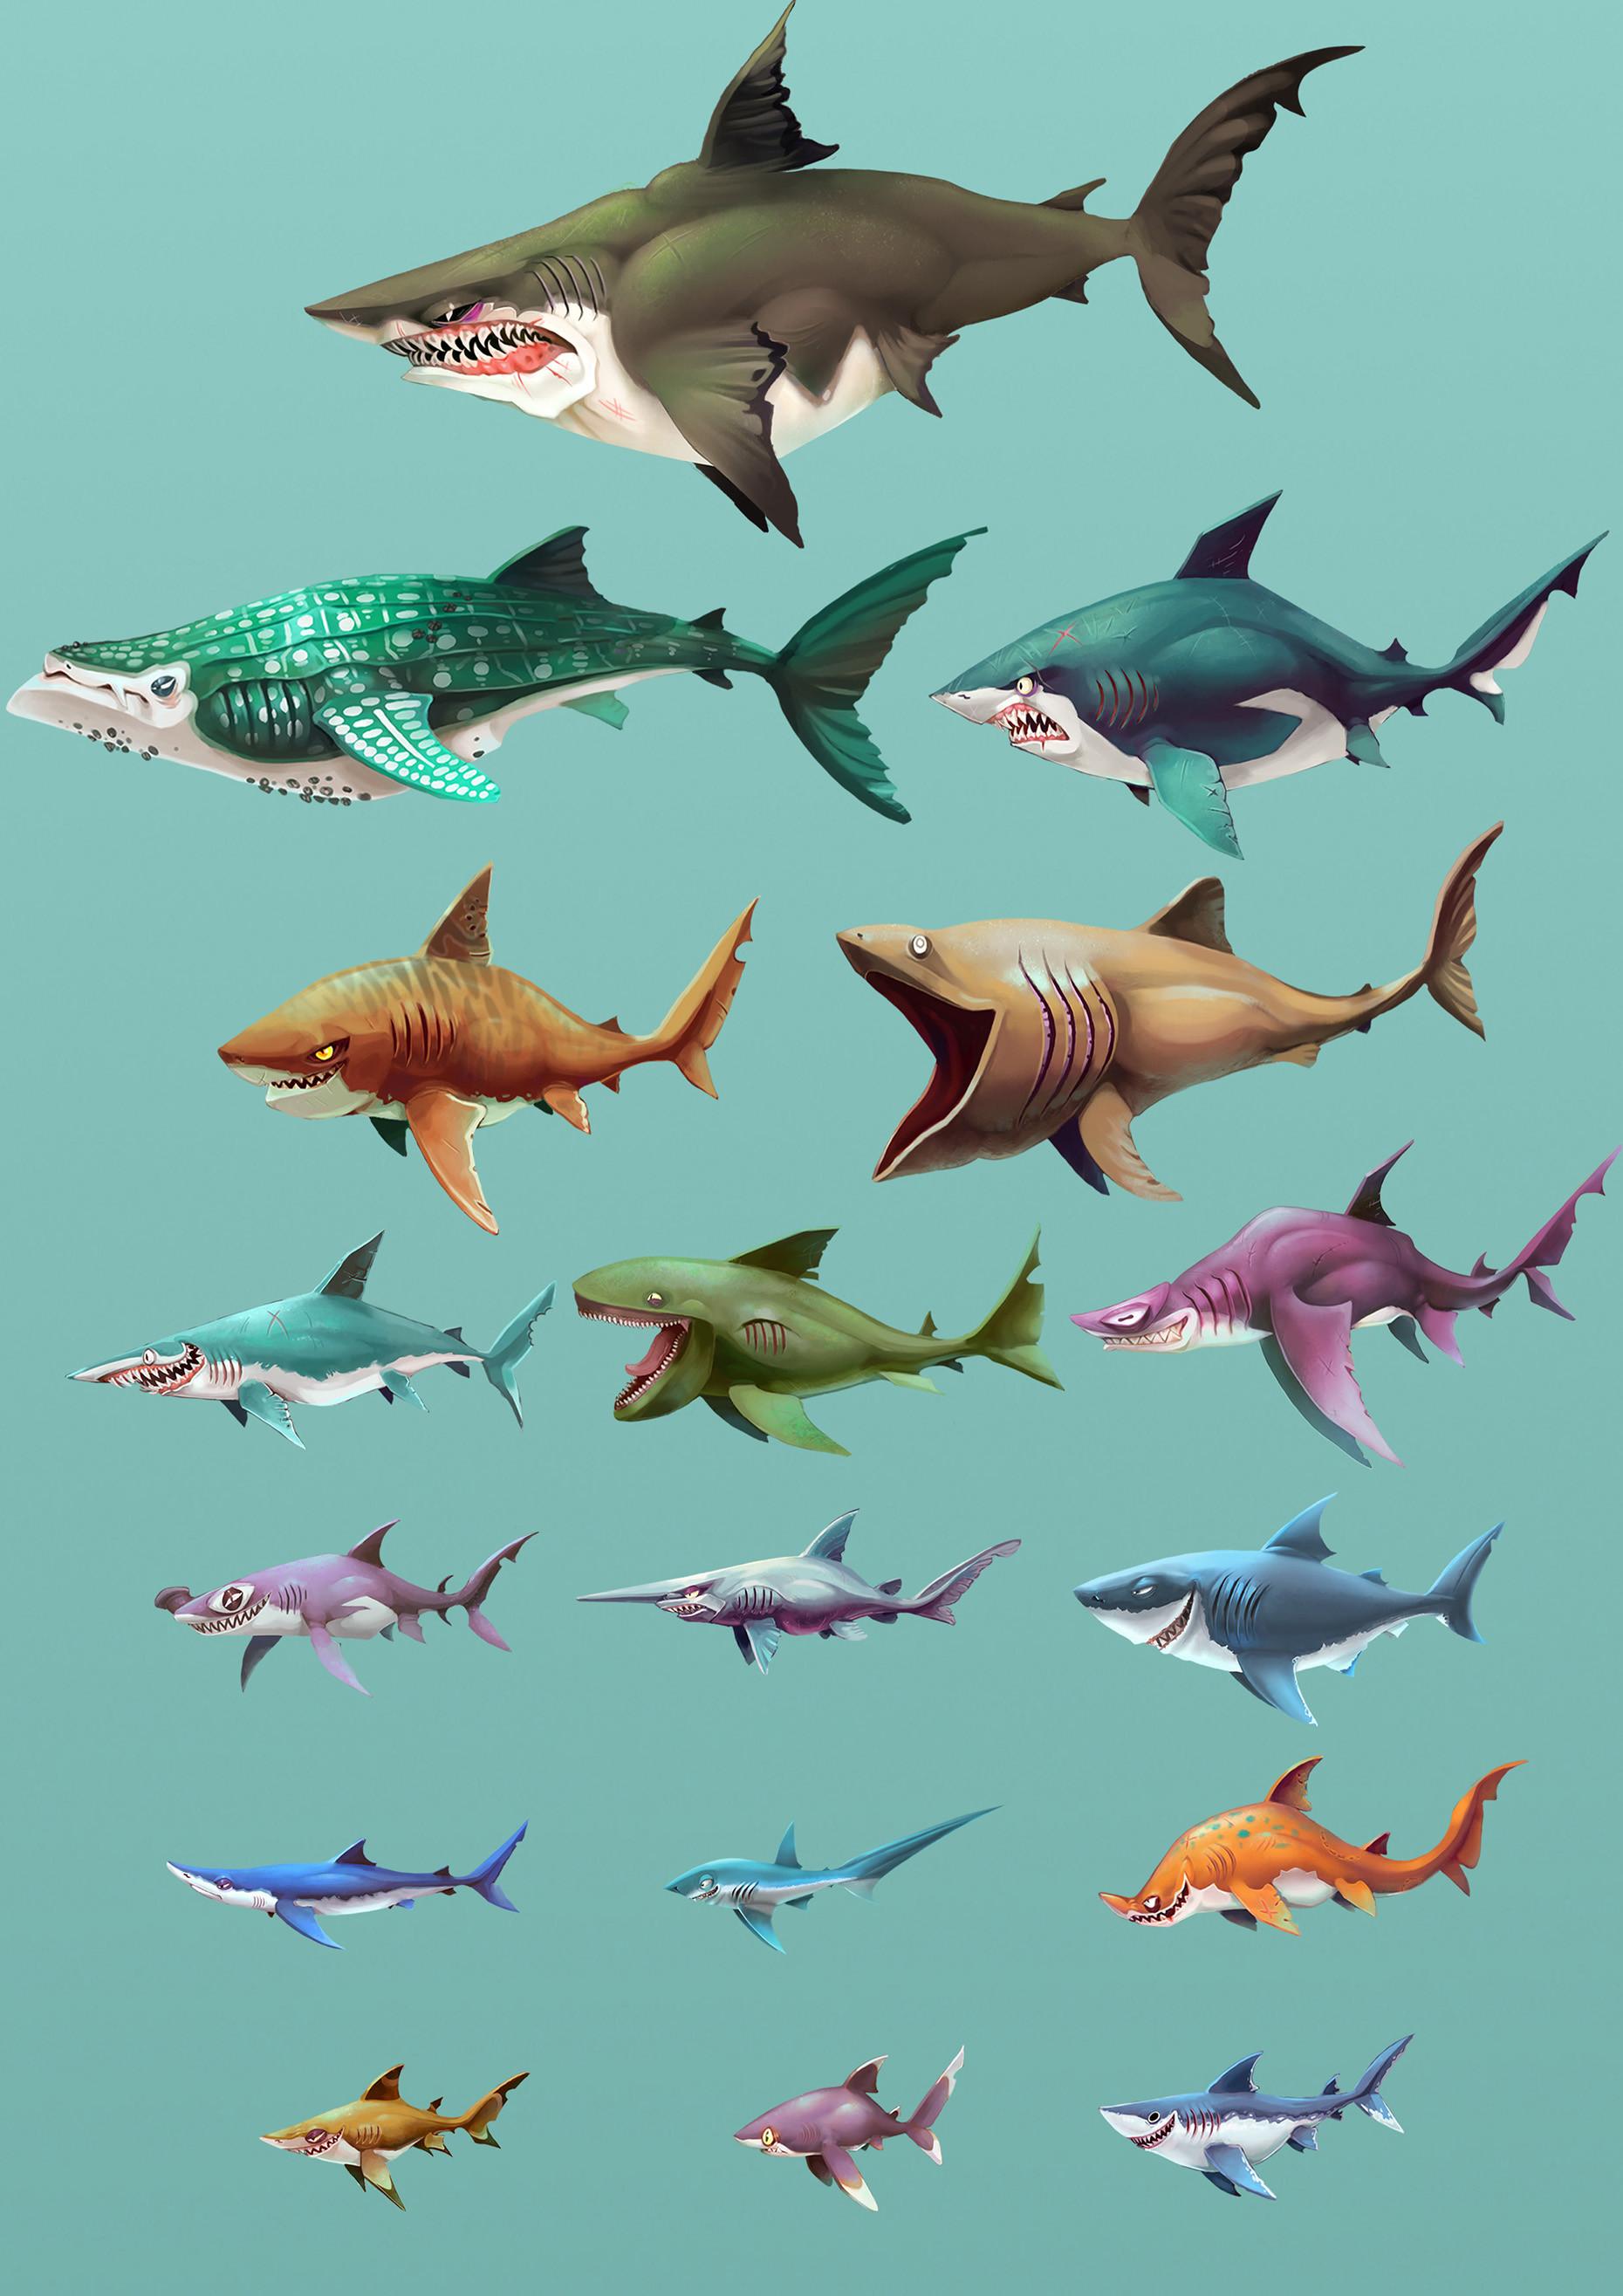 Johanna Cranston - Hungry Shark World - Playable Character Concepts